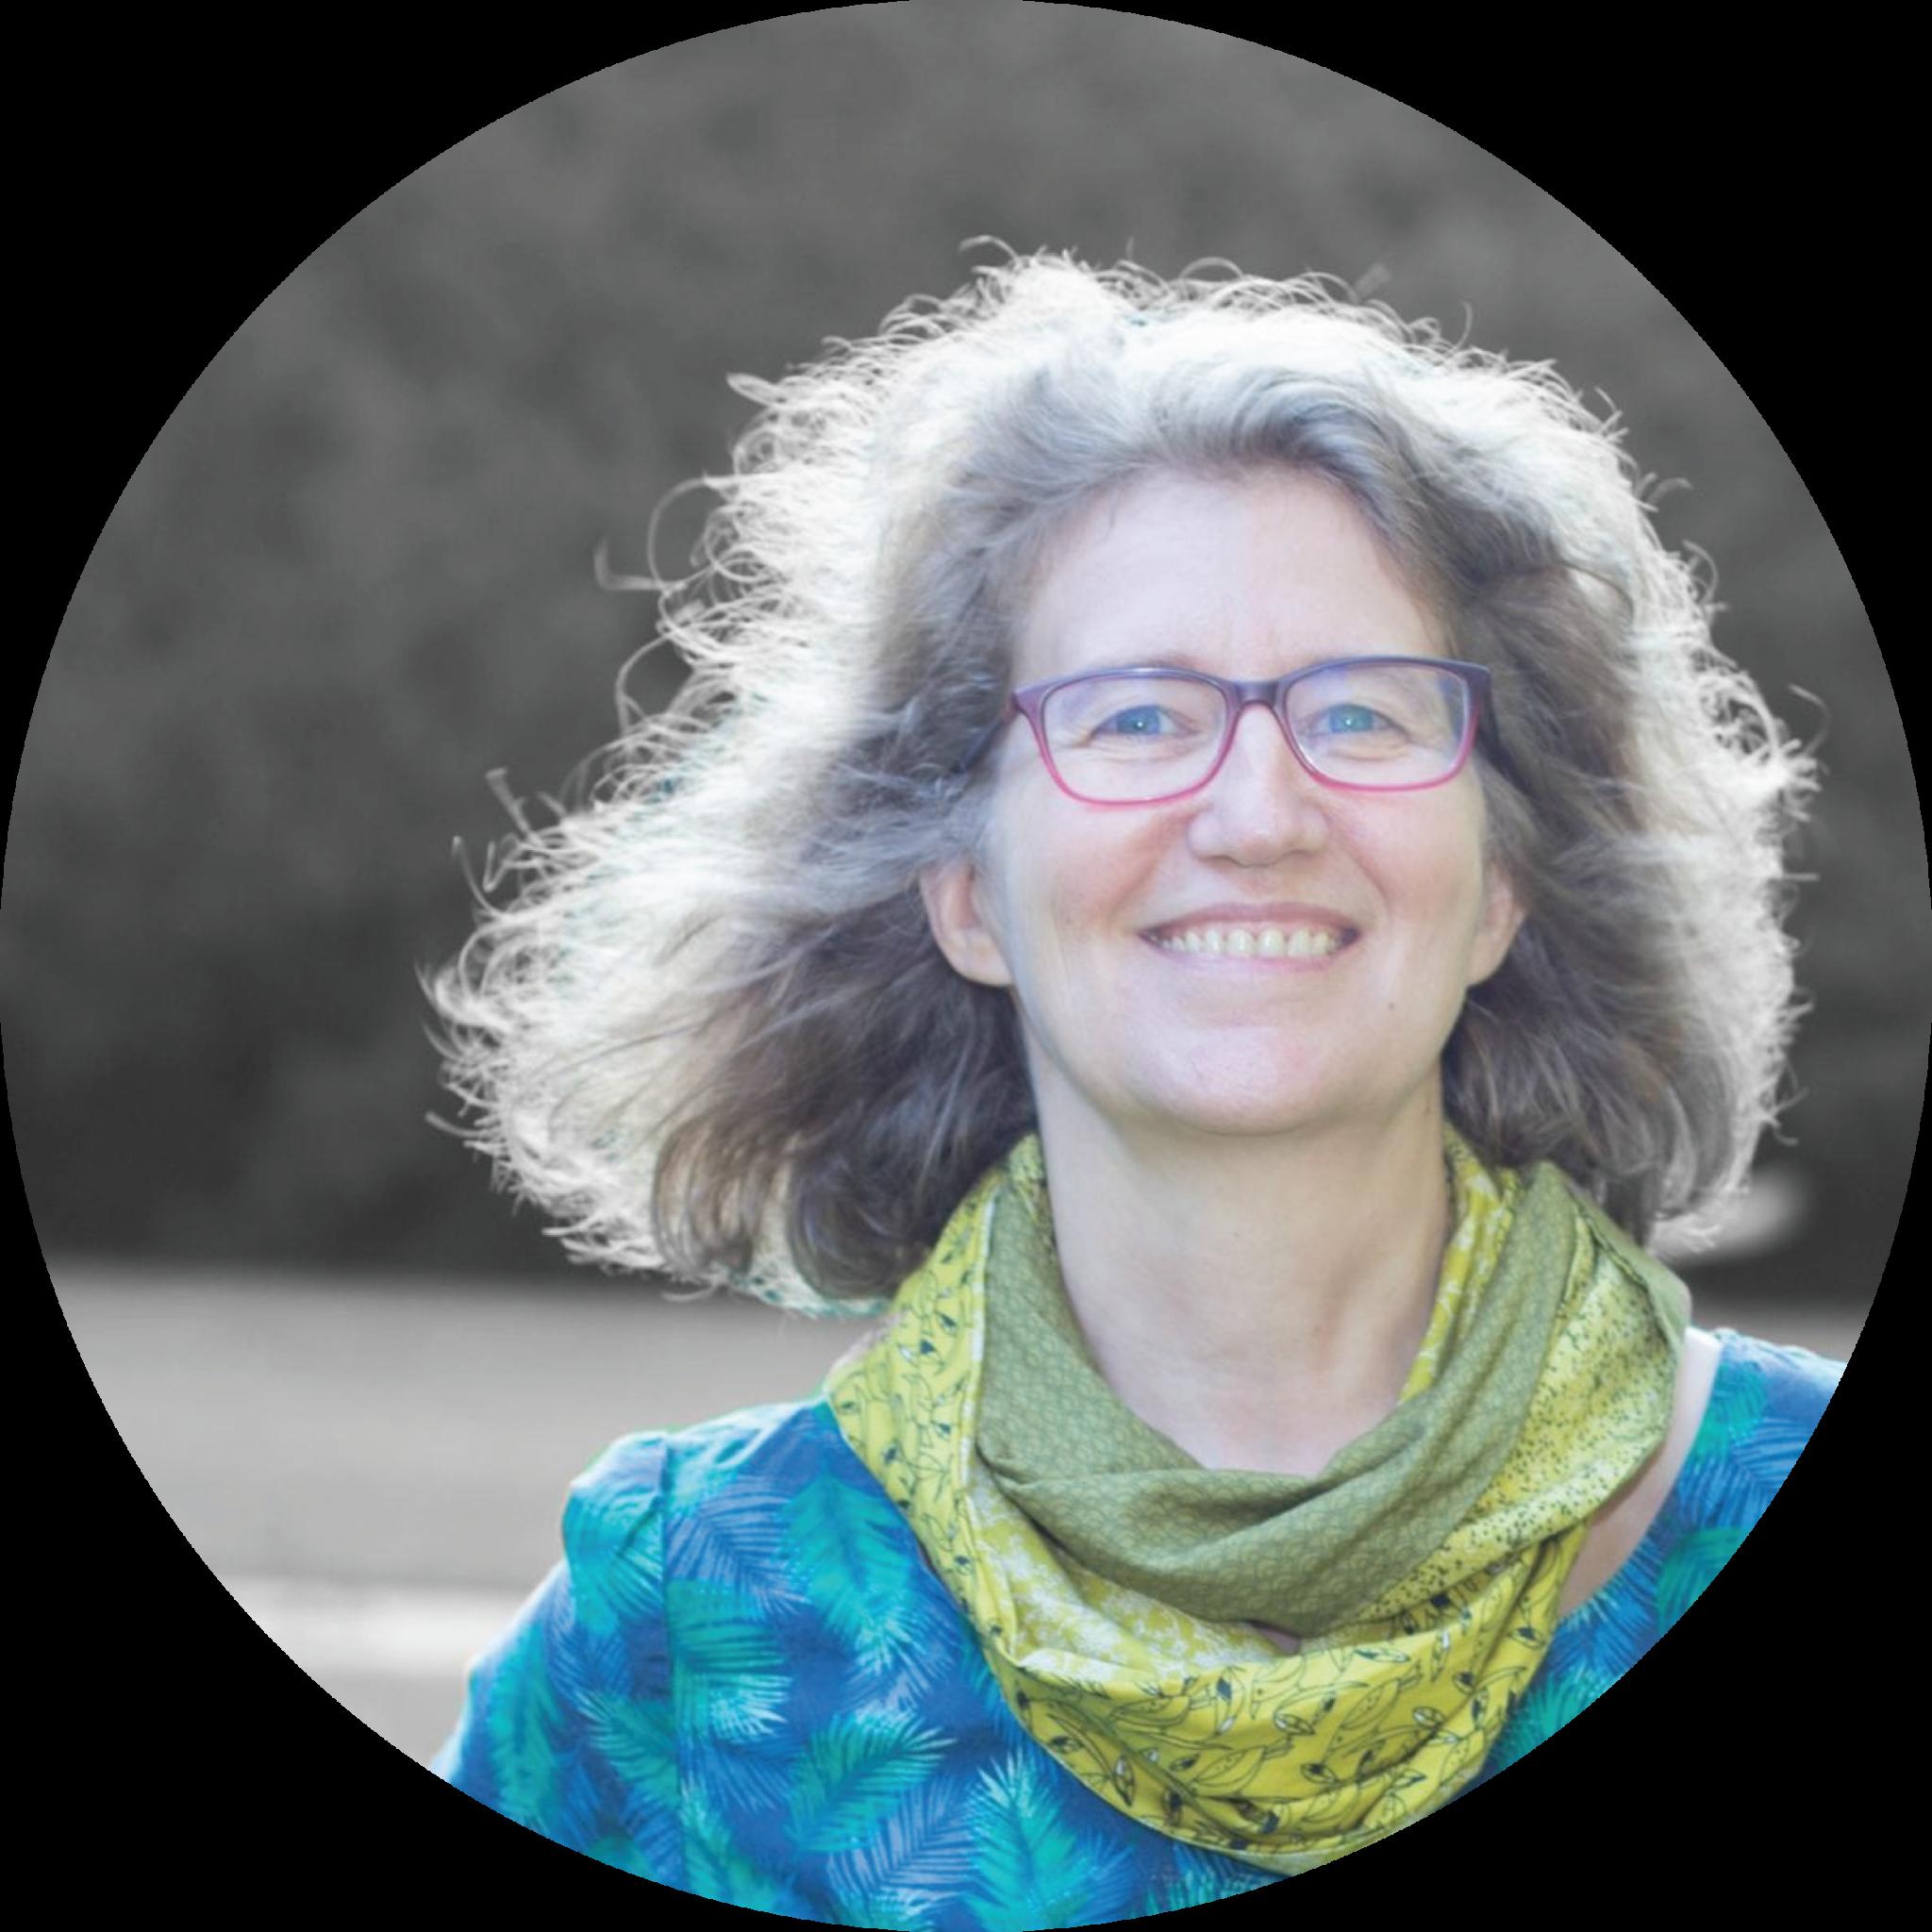 Françoise Van Malleghem